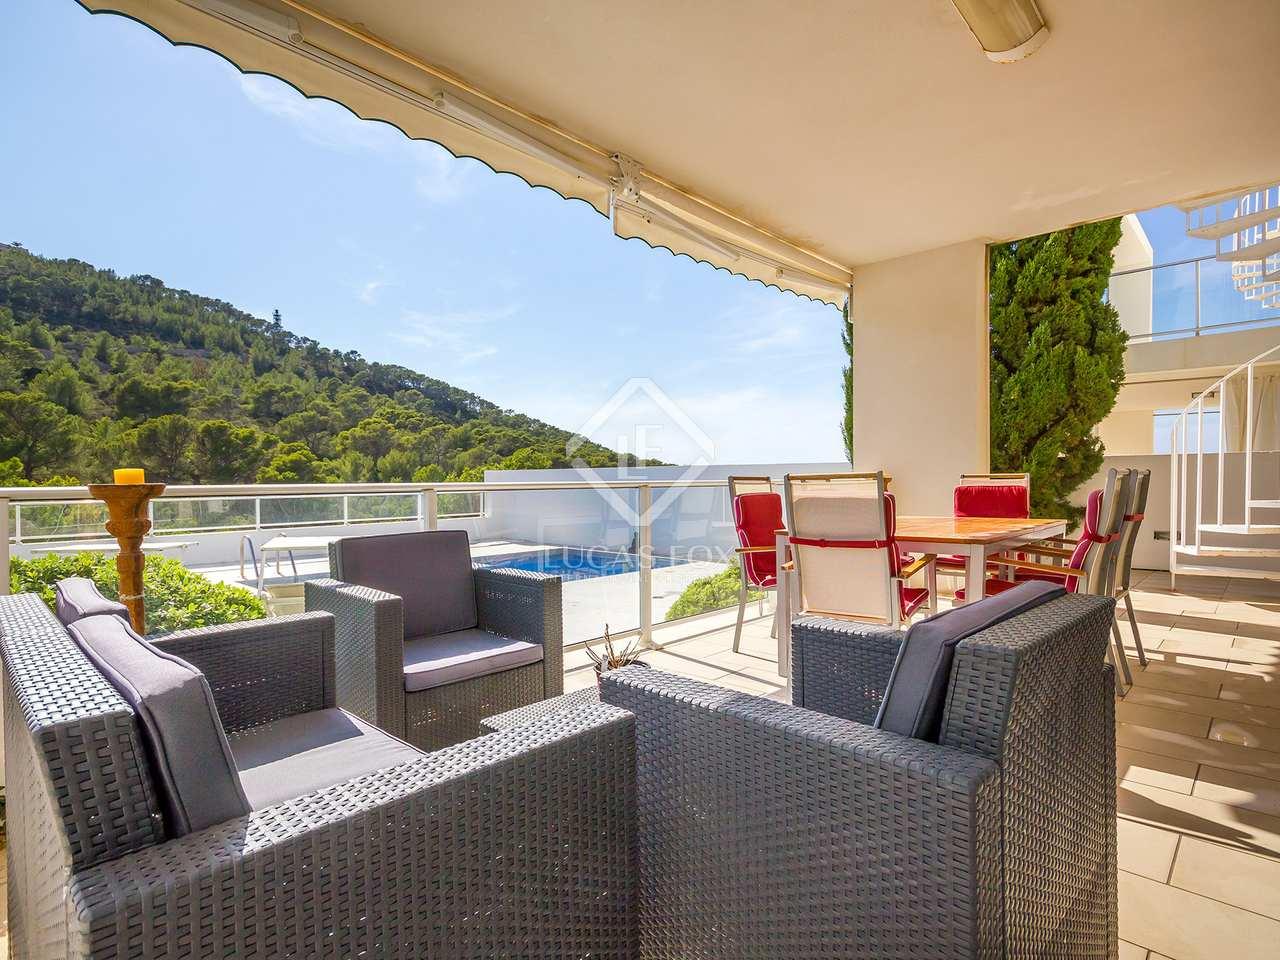 Casa impresionante en venta en cala vadella ibiza - Casas espectaculares en espana ...